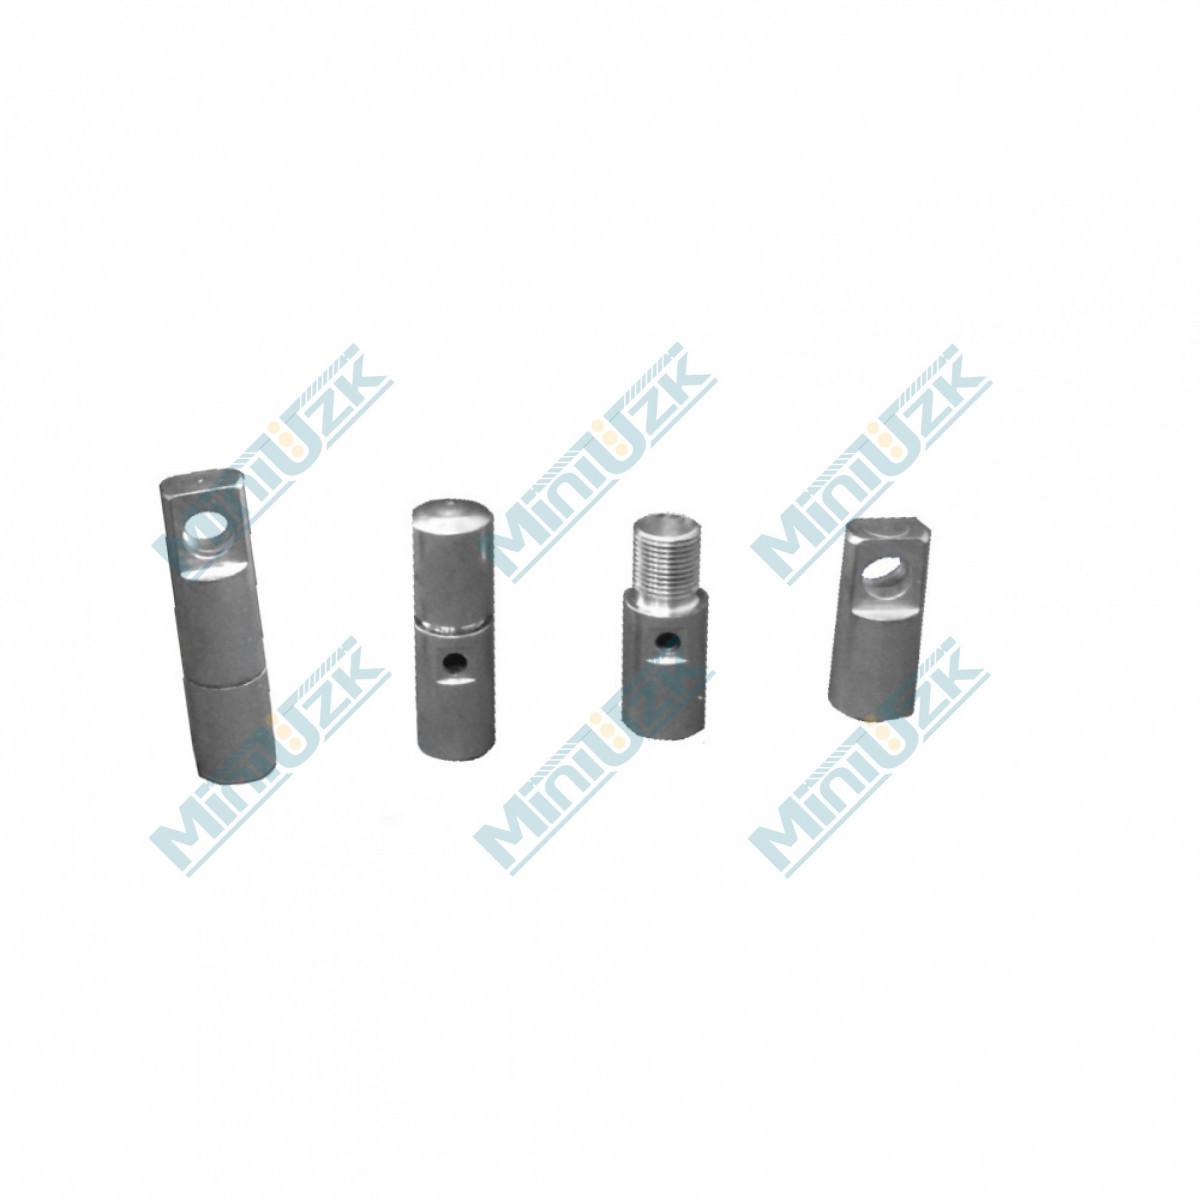 Устройство закладки кабеля (УЗК) OlmiOn СП-Б-9/450